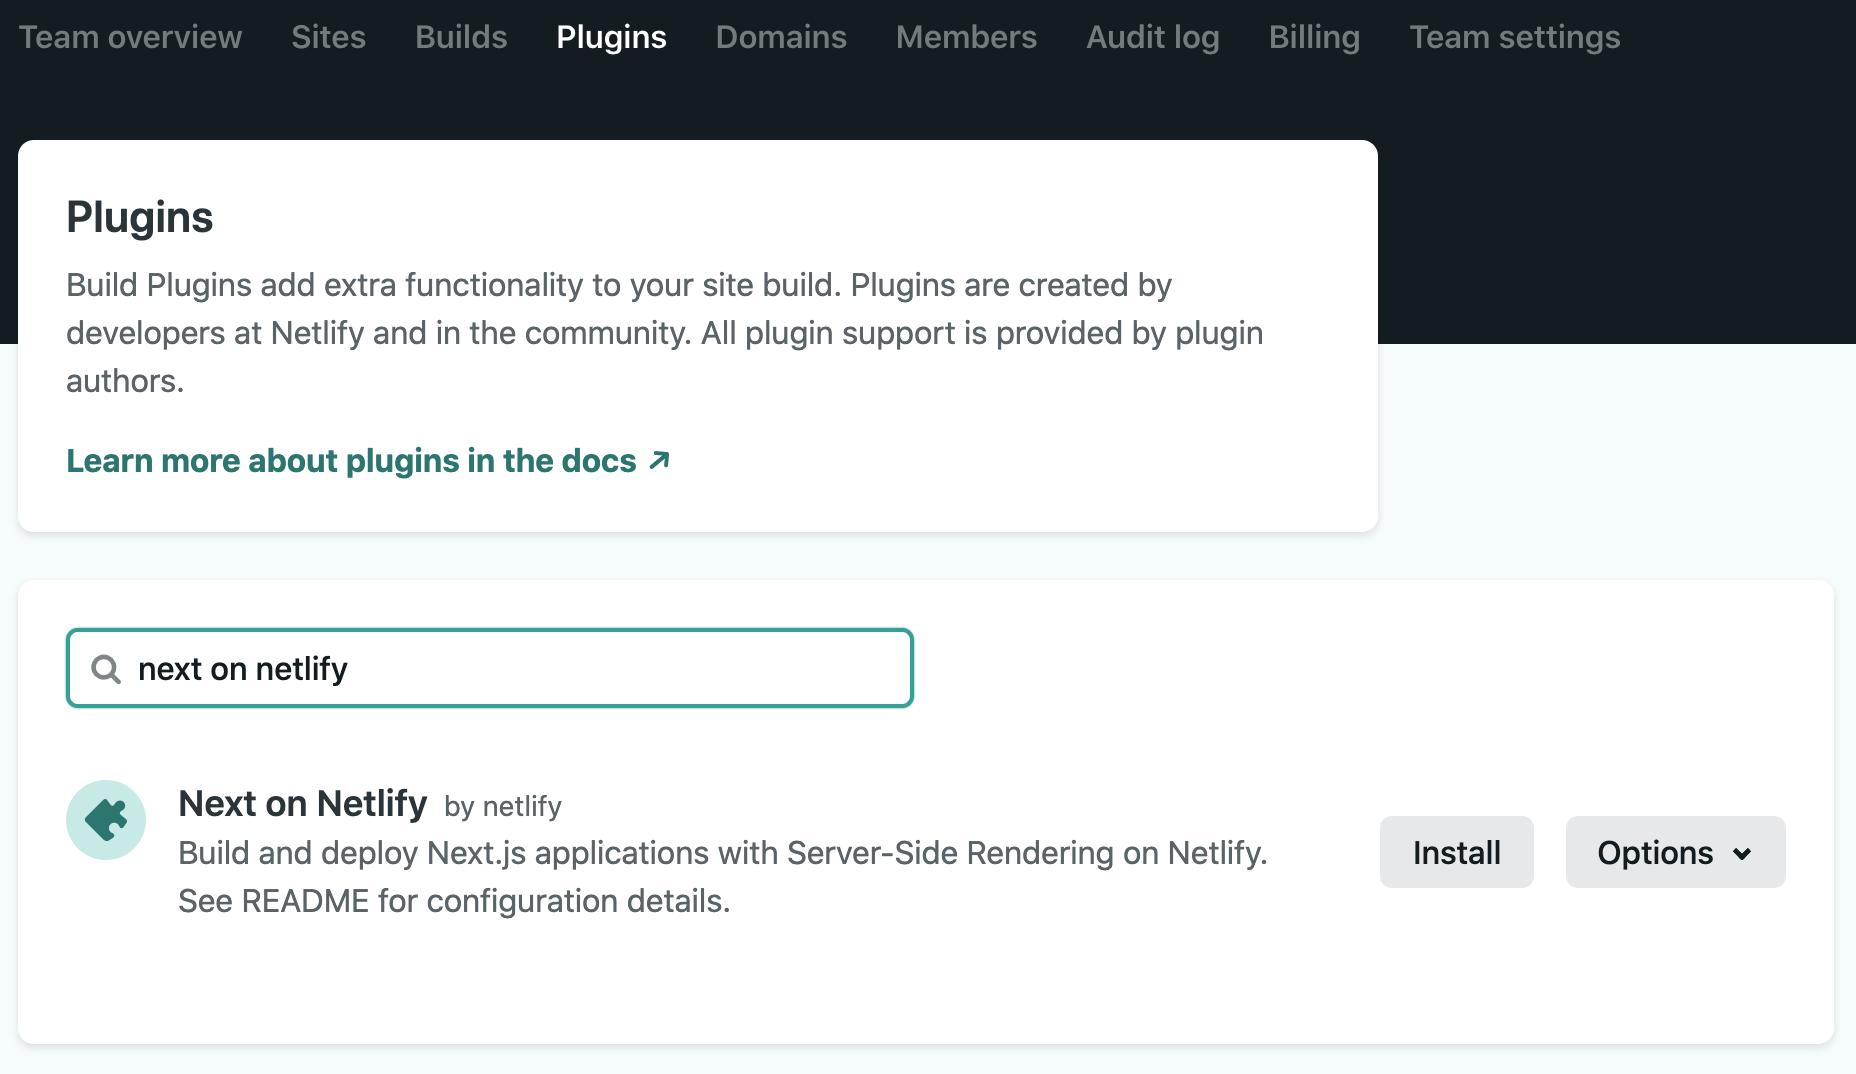 Next.js Build Plugin in the UI